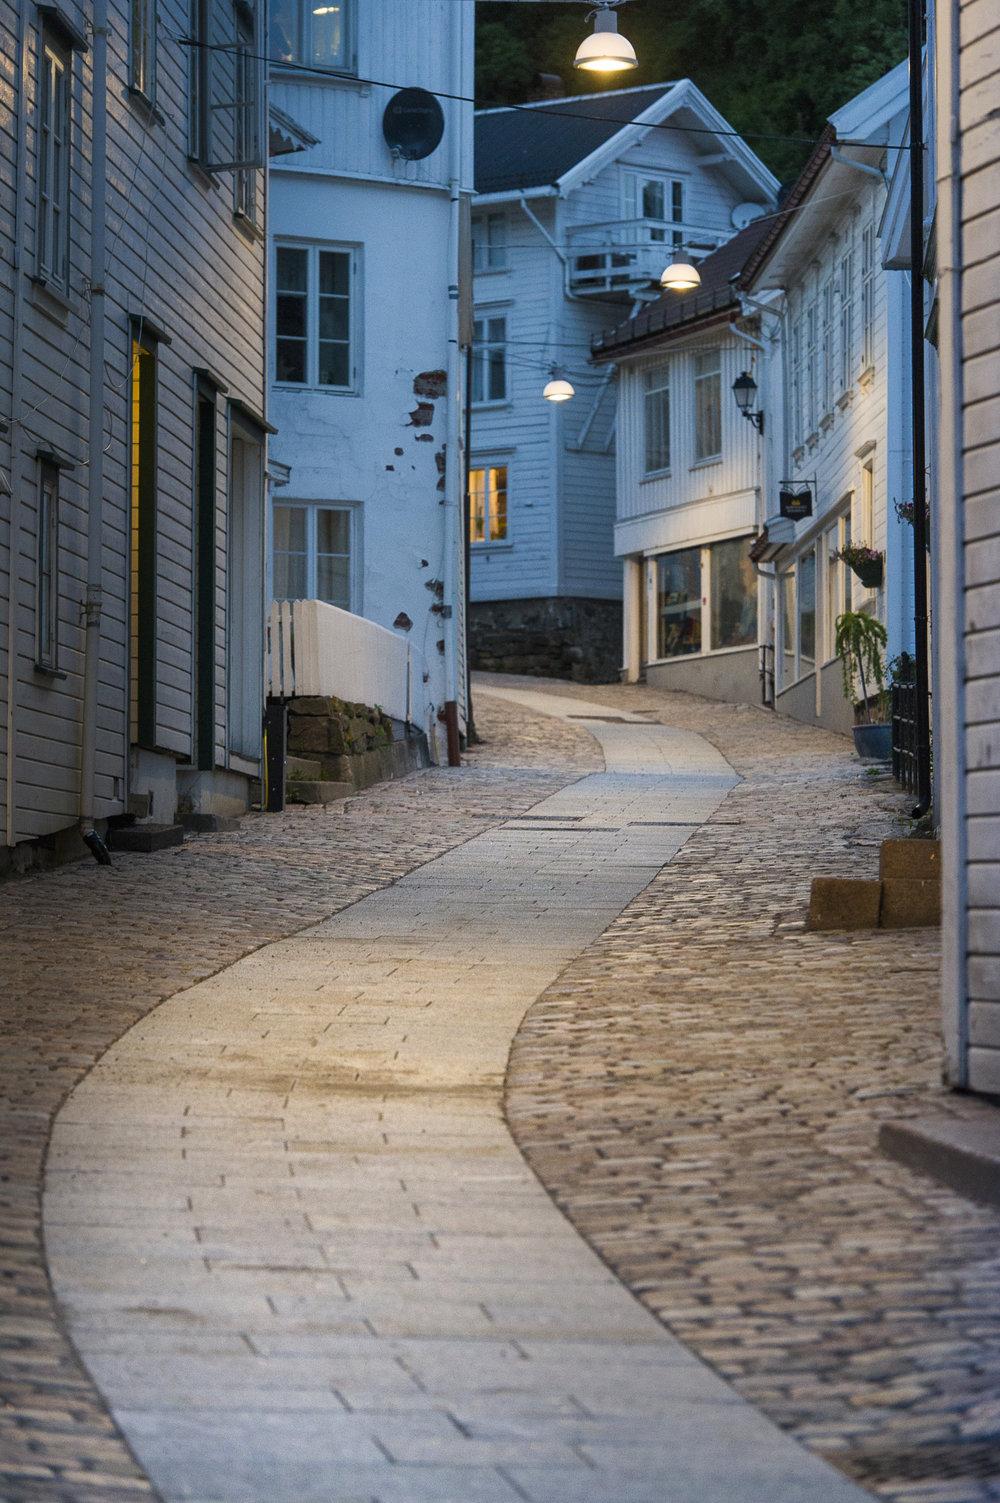 20160621-tvedestrand-0973.jpg